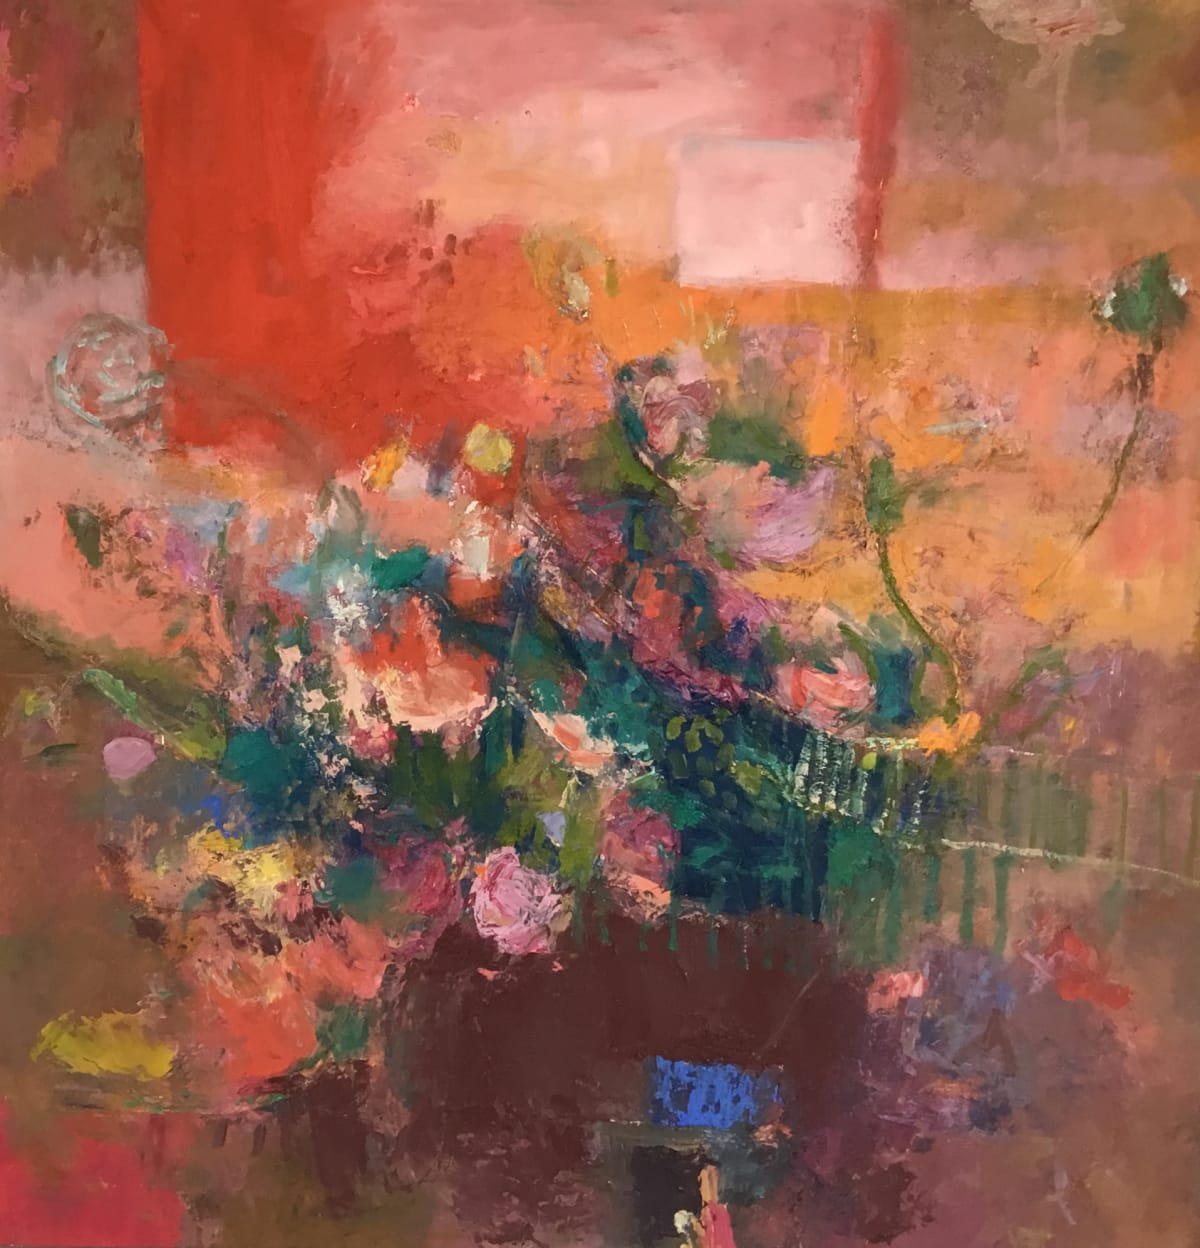 Teresa Pemberton, Summer Roses, 2019